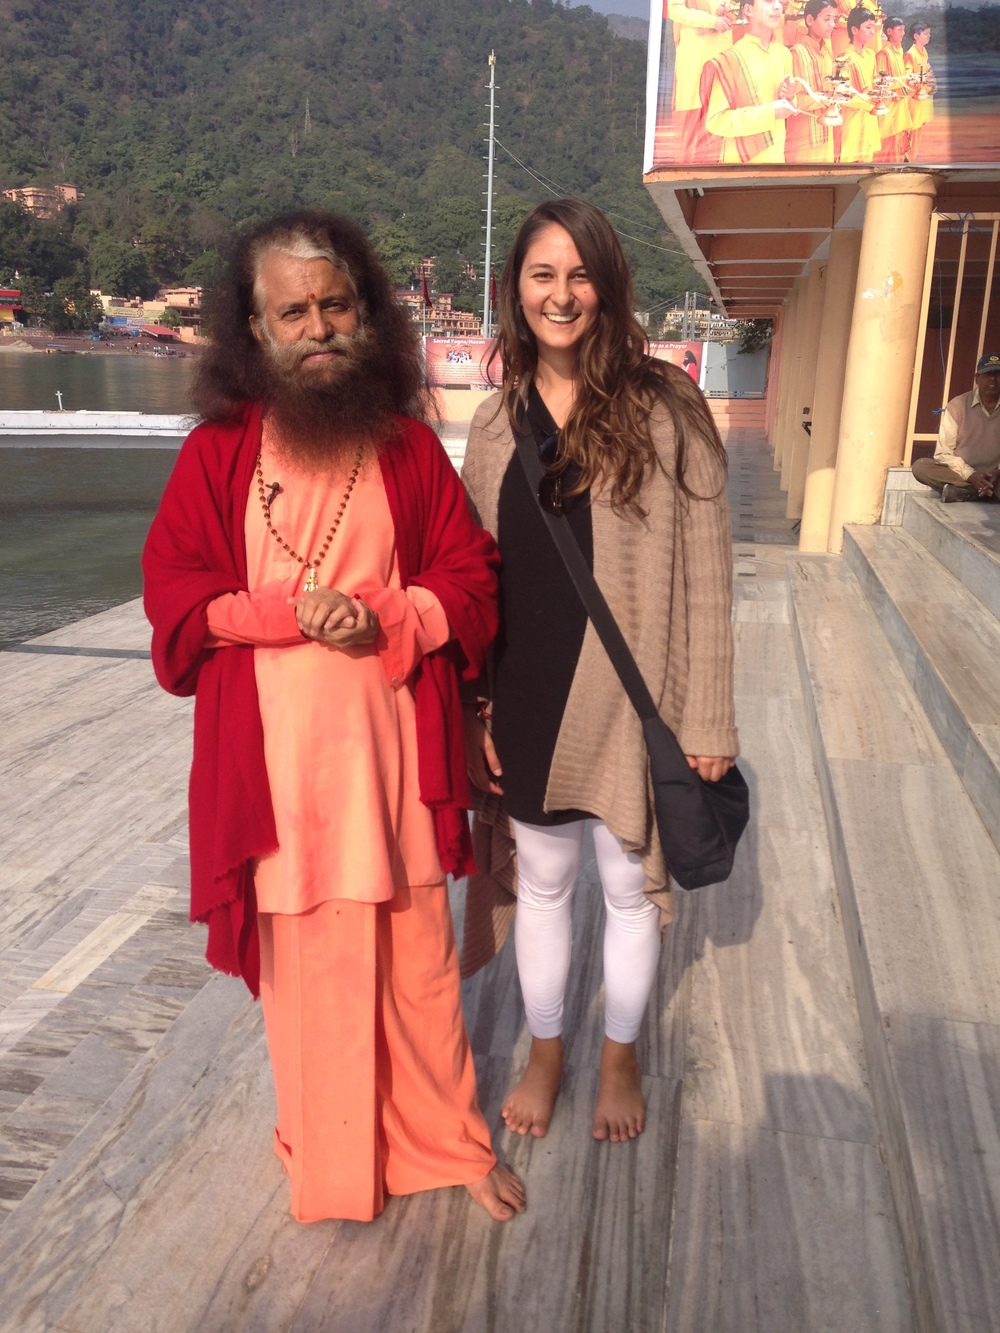 With P ujya Swami Chidanand Saraswati